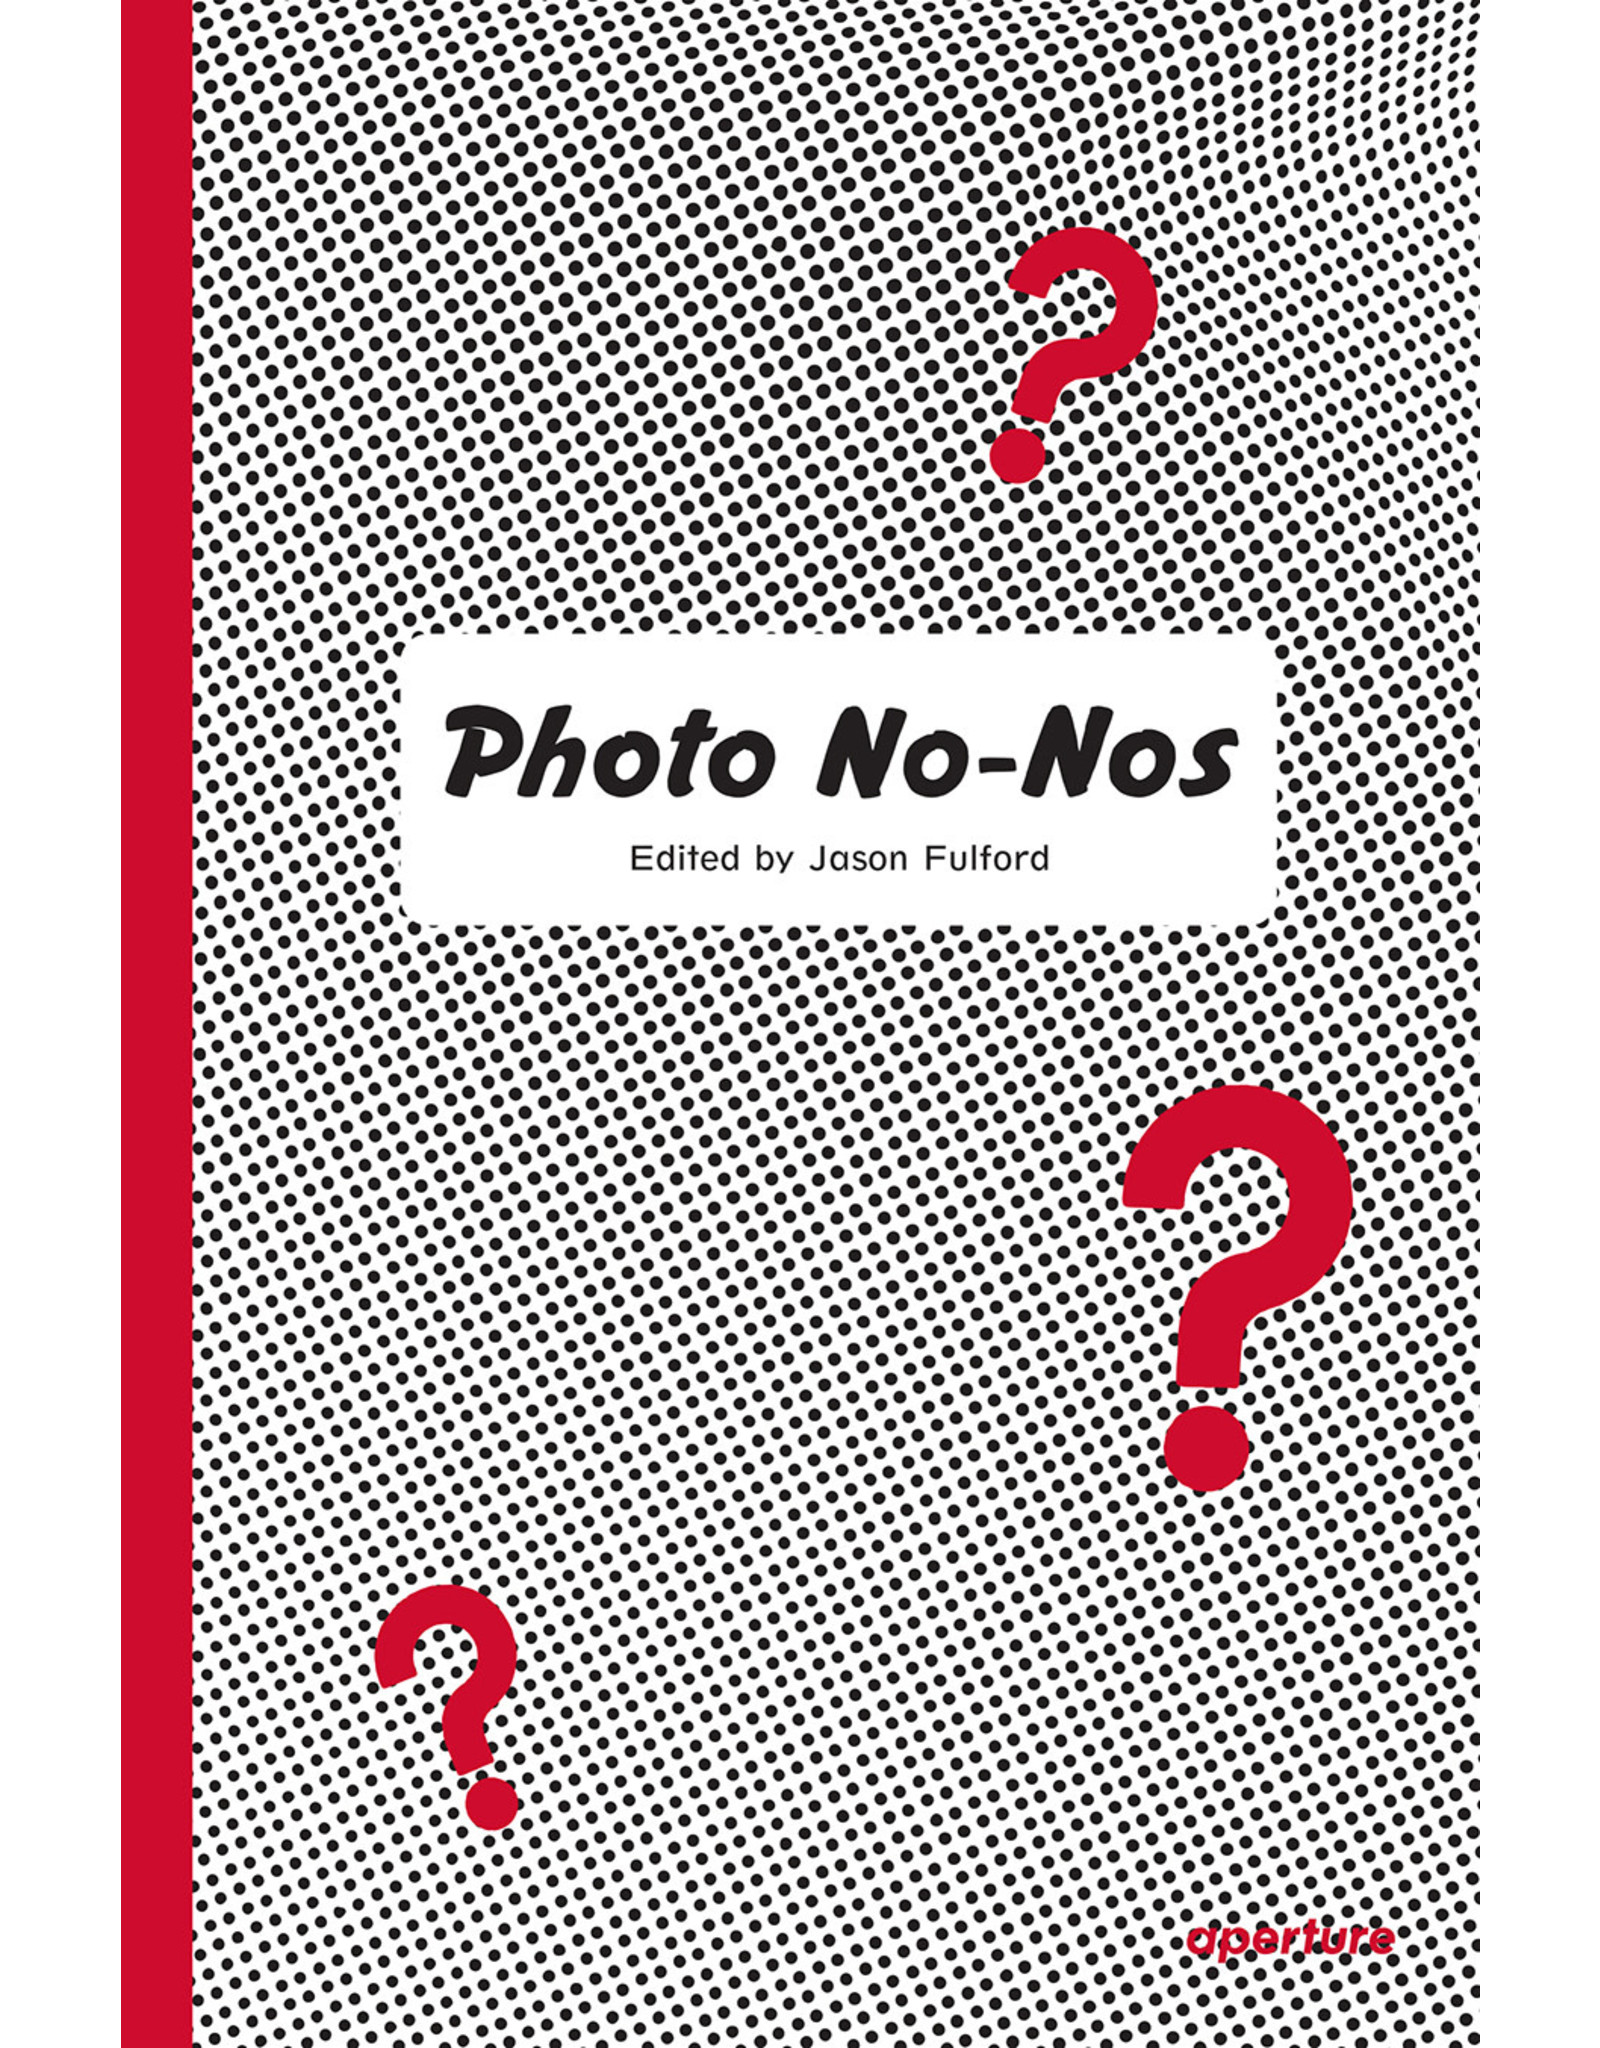 Photo No-Nos